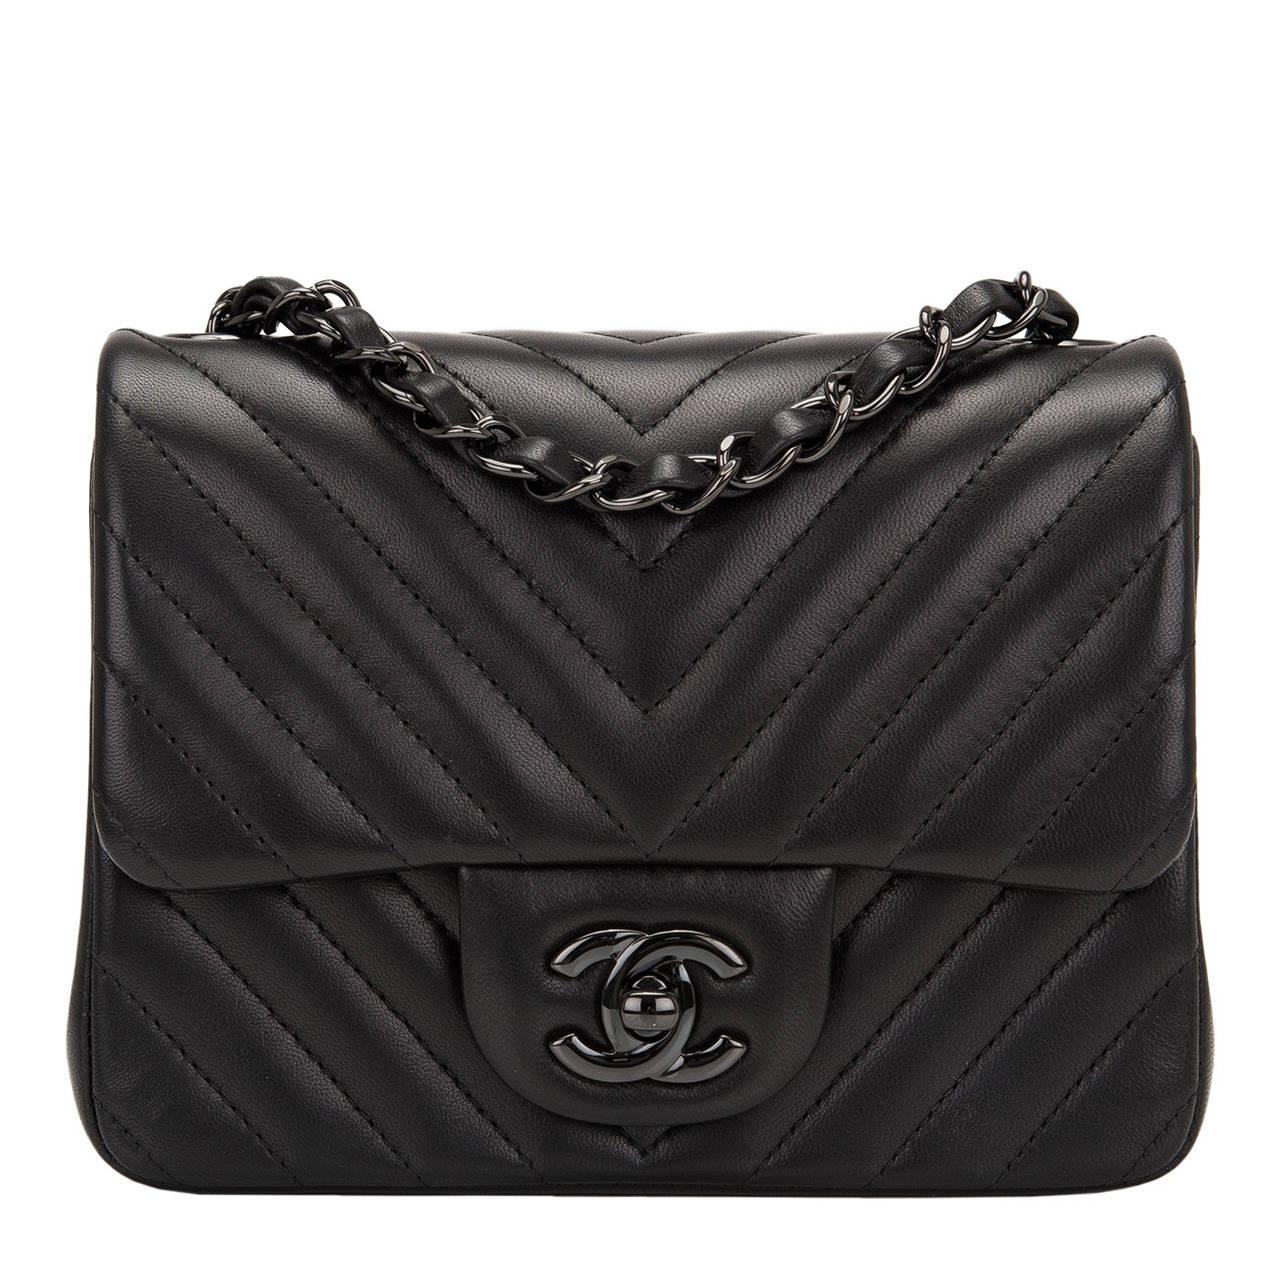 Chanel So Black Chevron Mini Flap Bag At 1stdibs